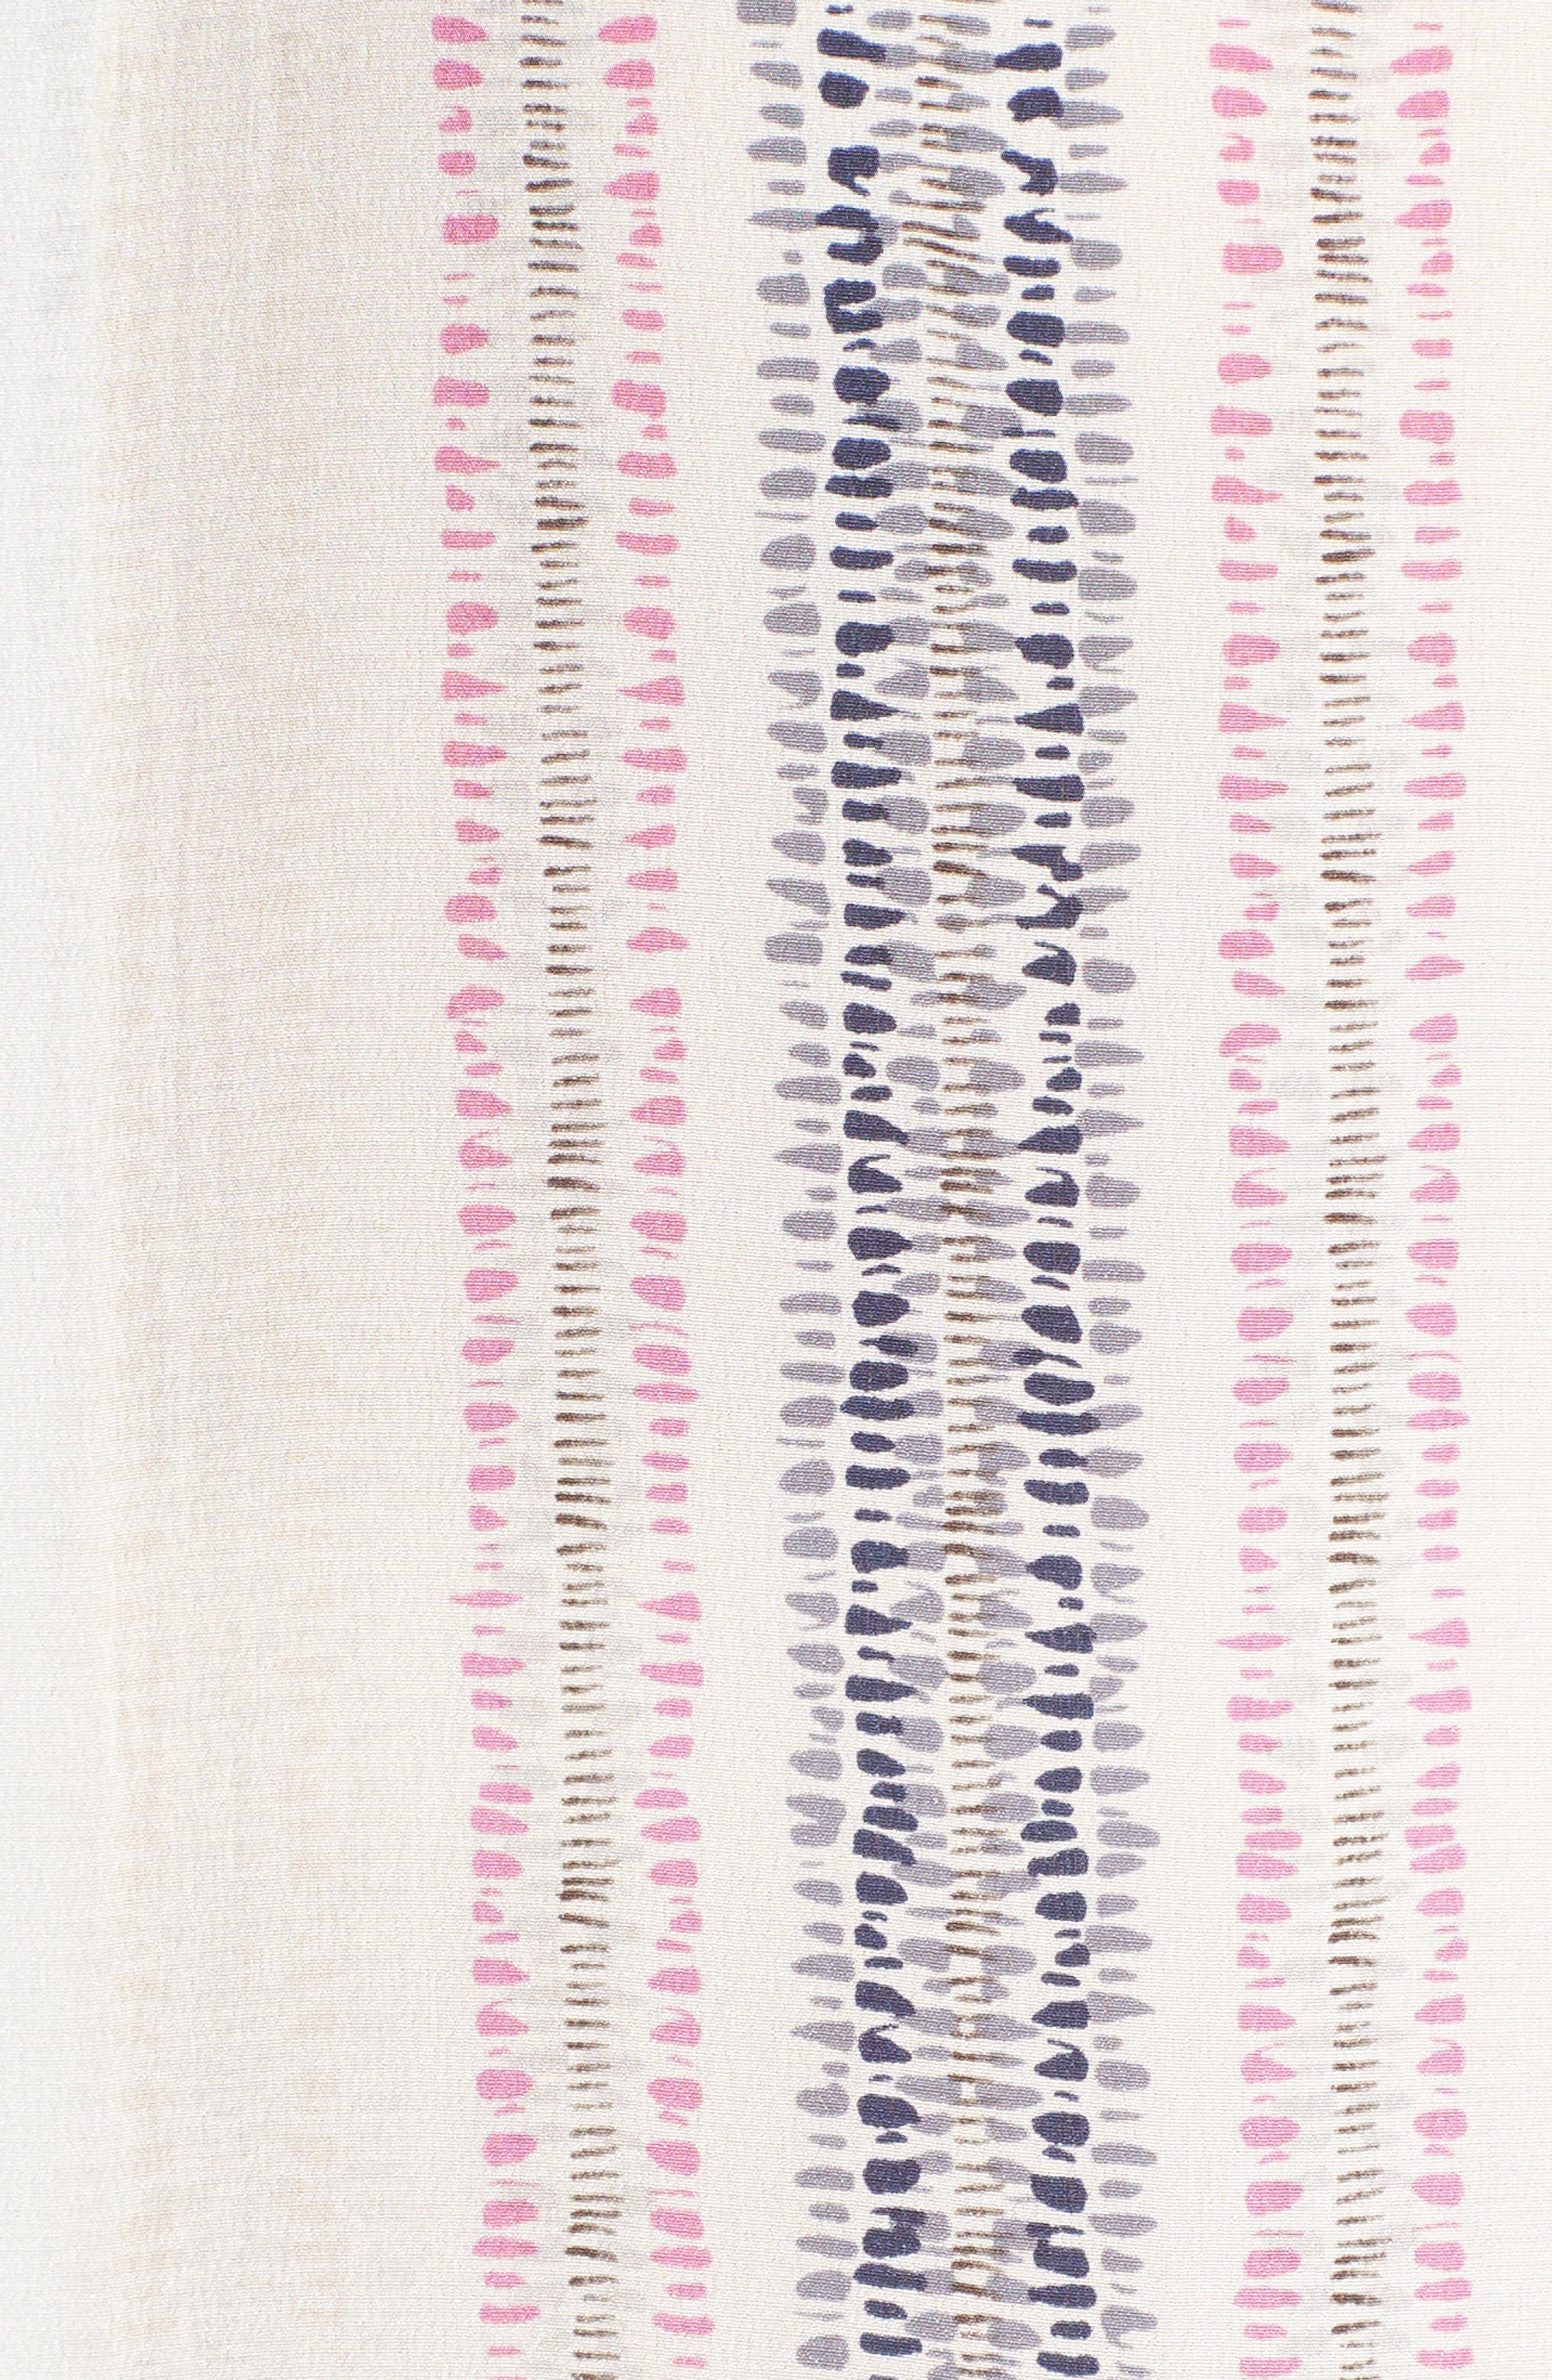 Stitch Lines Silk Top,                             Alternate thumbnail 5, color,                             490